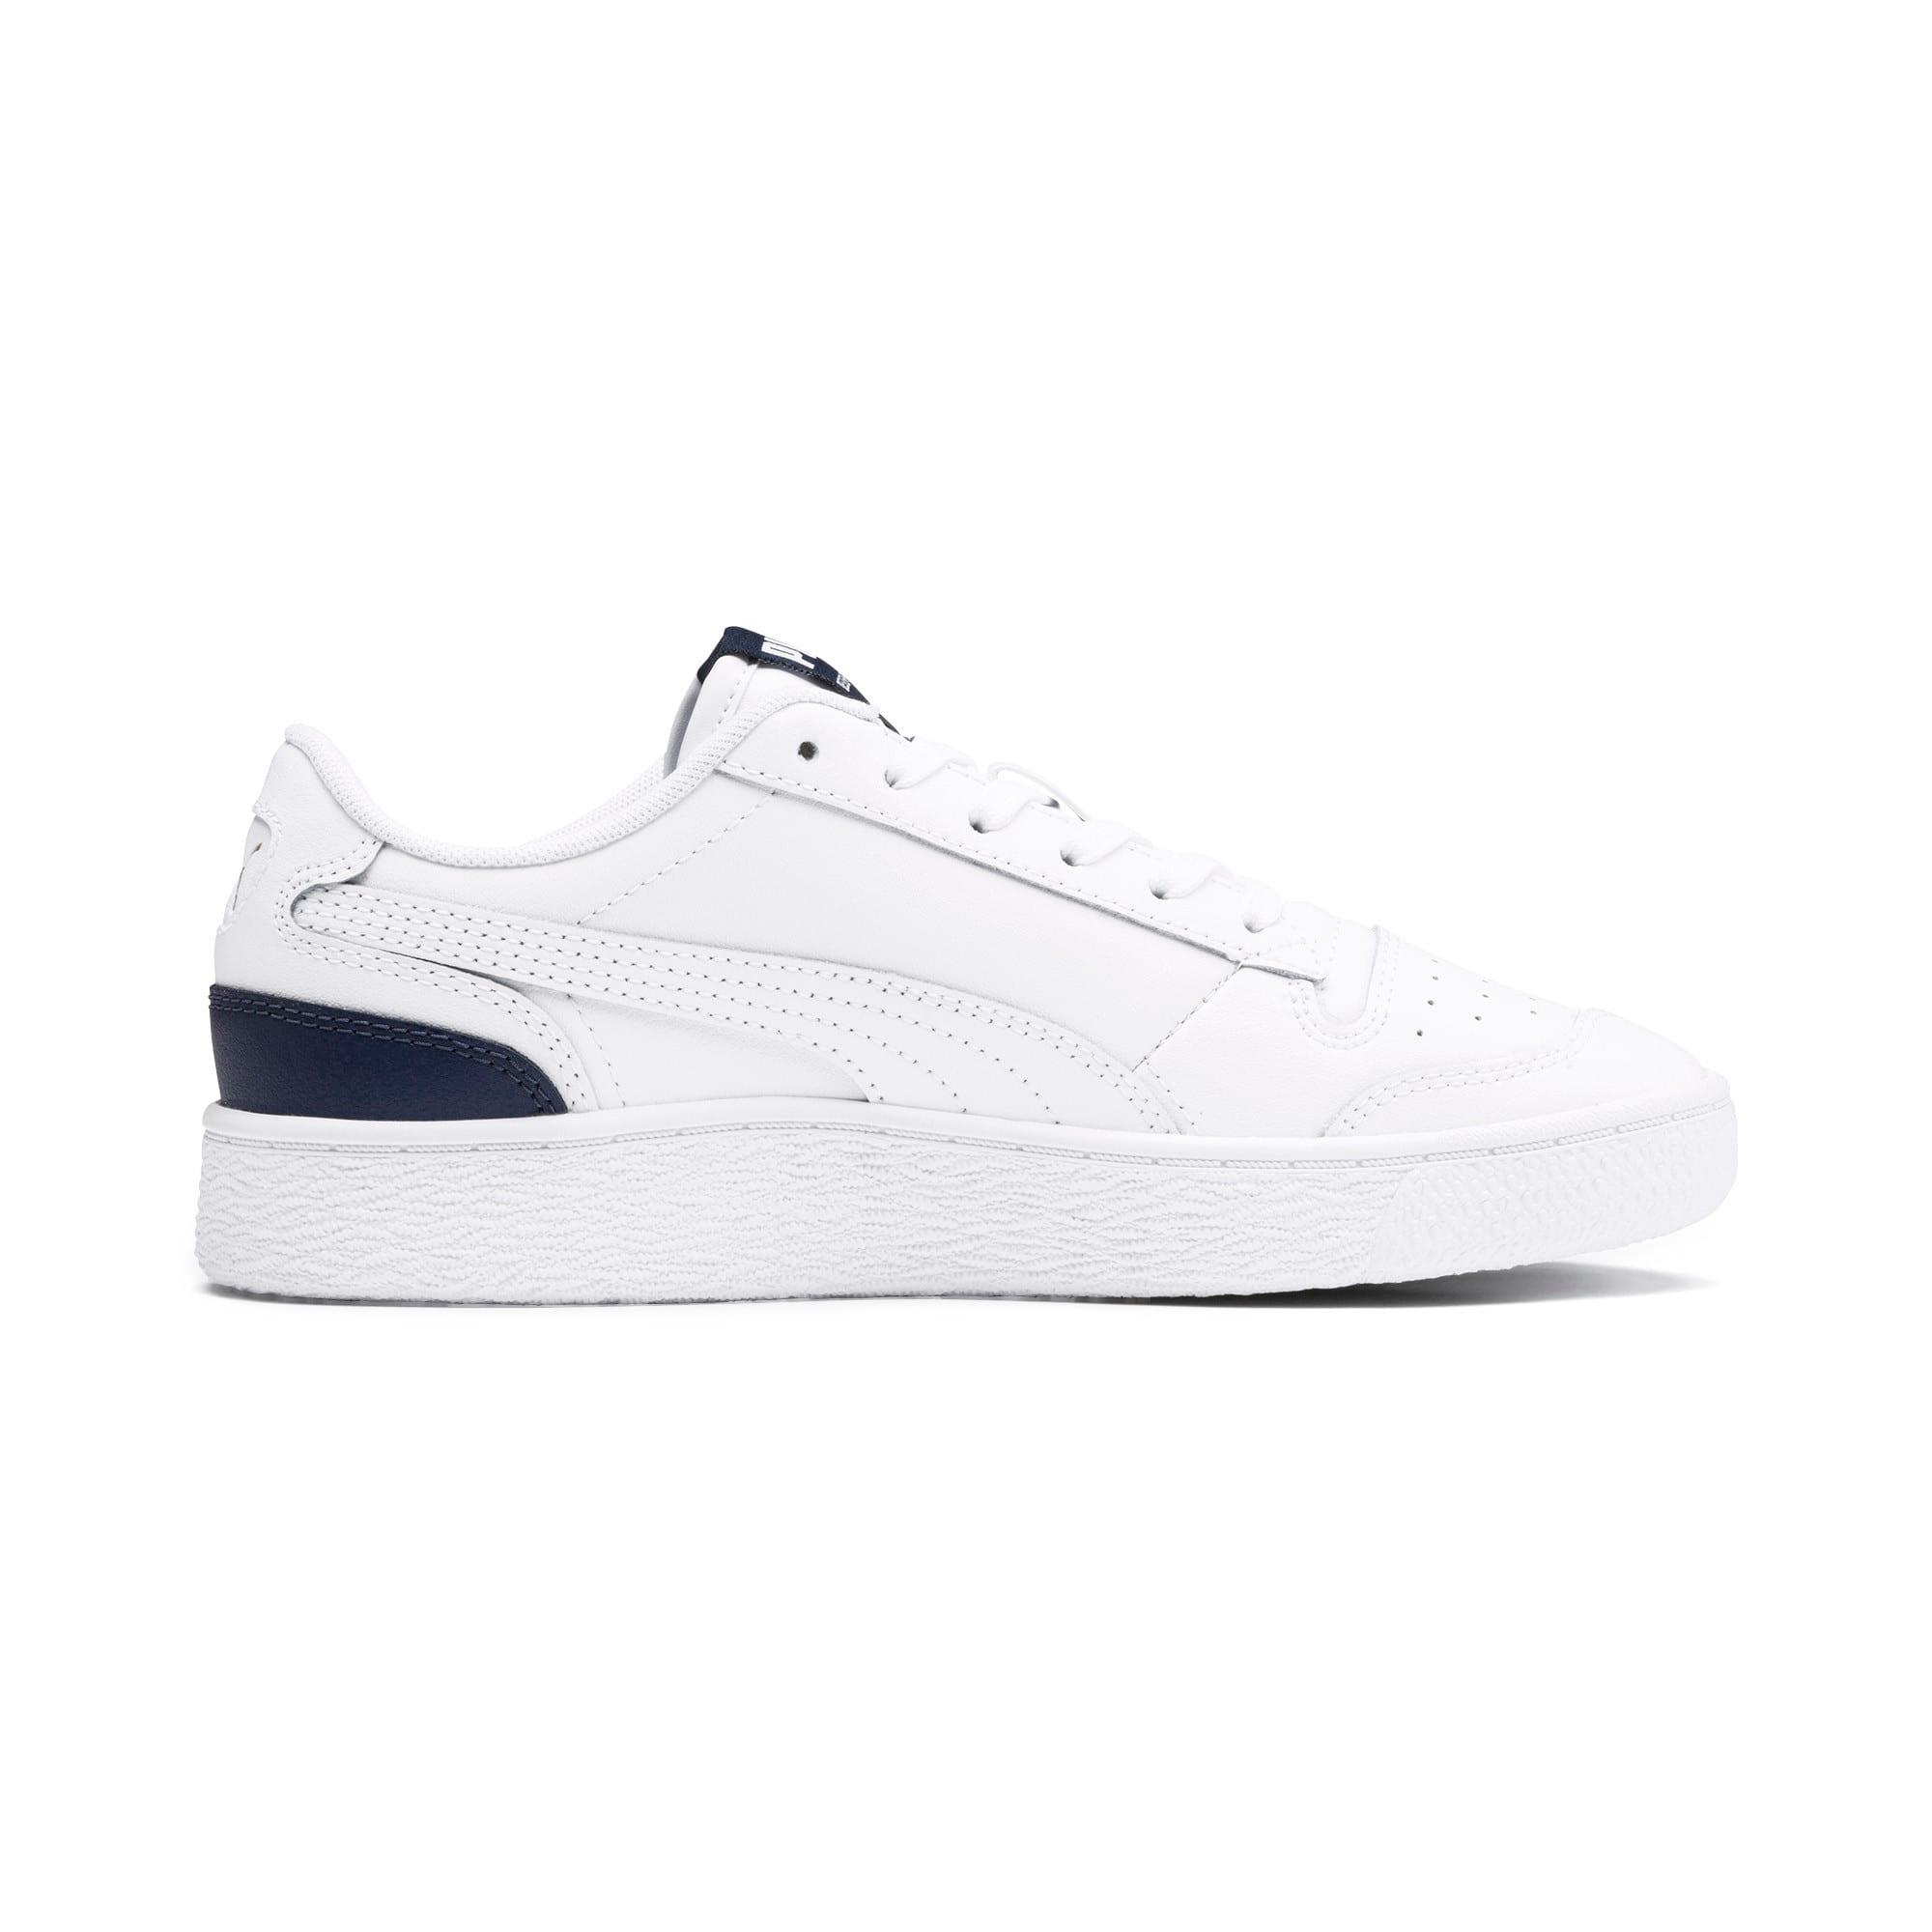 Thumbnail 5 of Ralph Sampson Lo Sneakers JR, White-Peacoat-White, medium